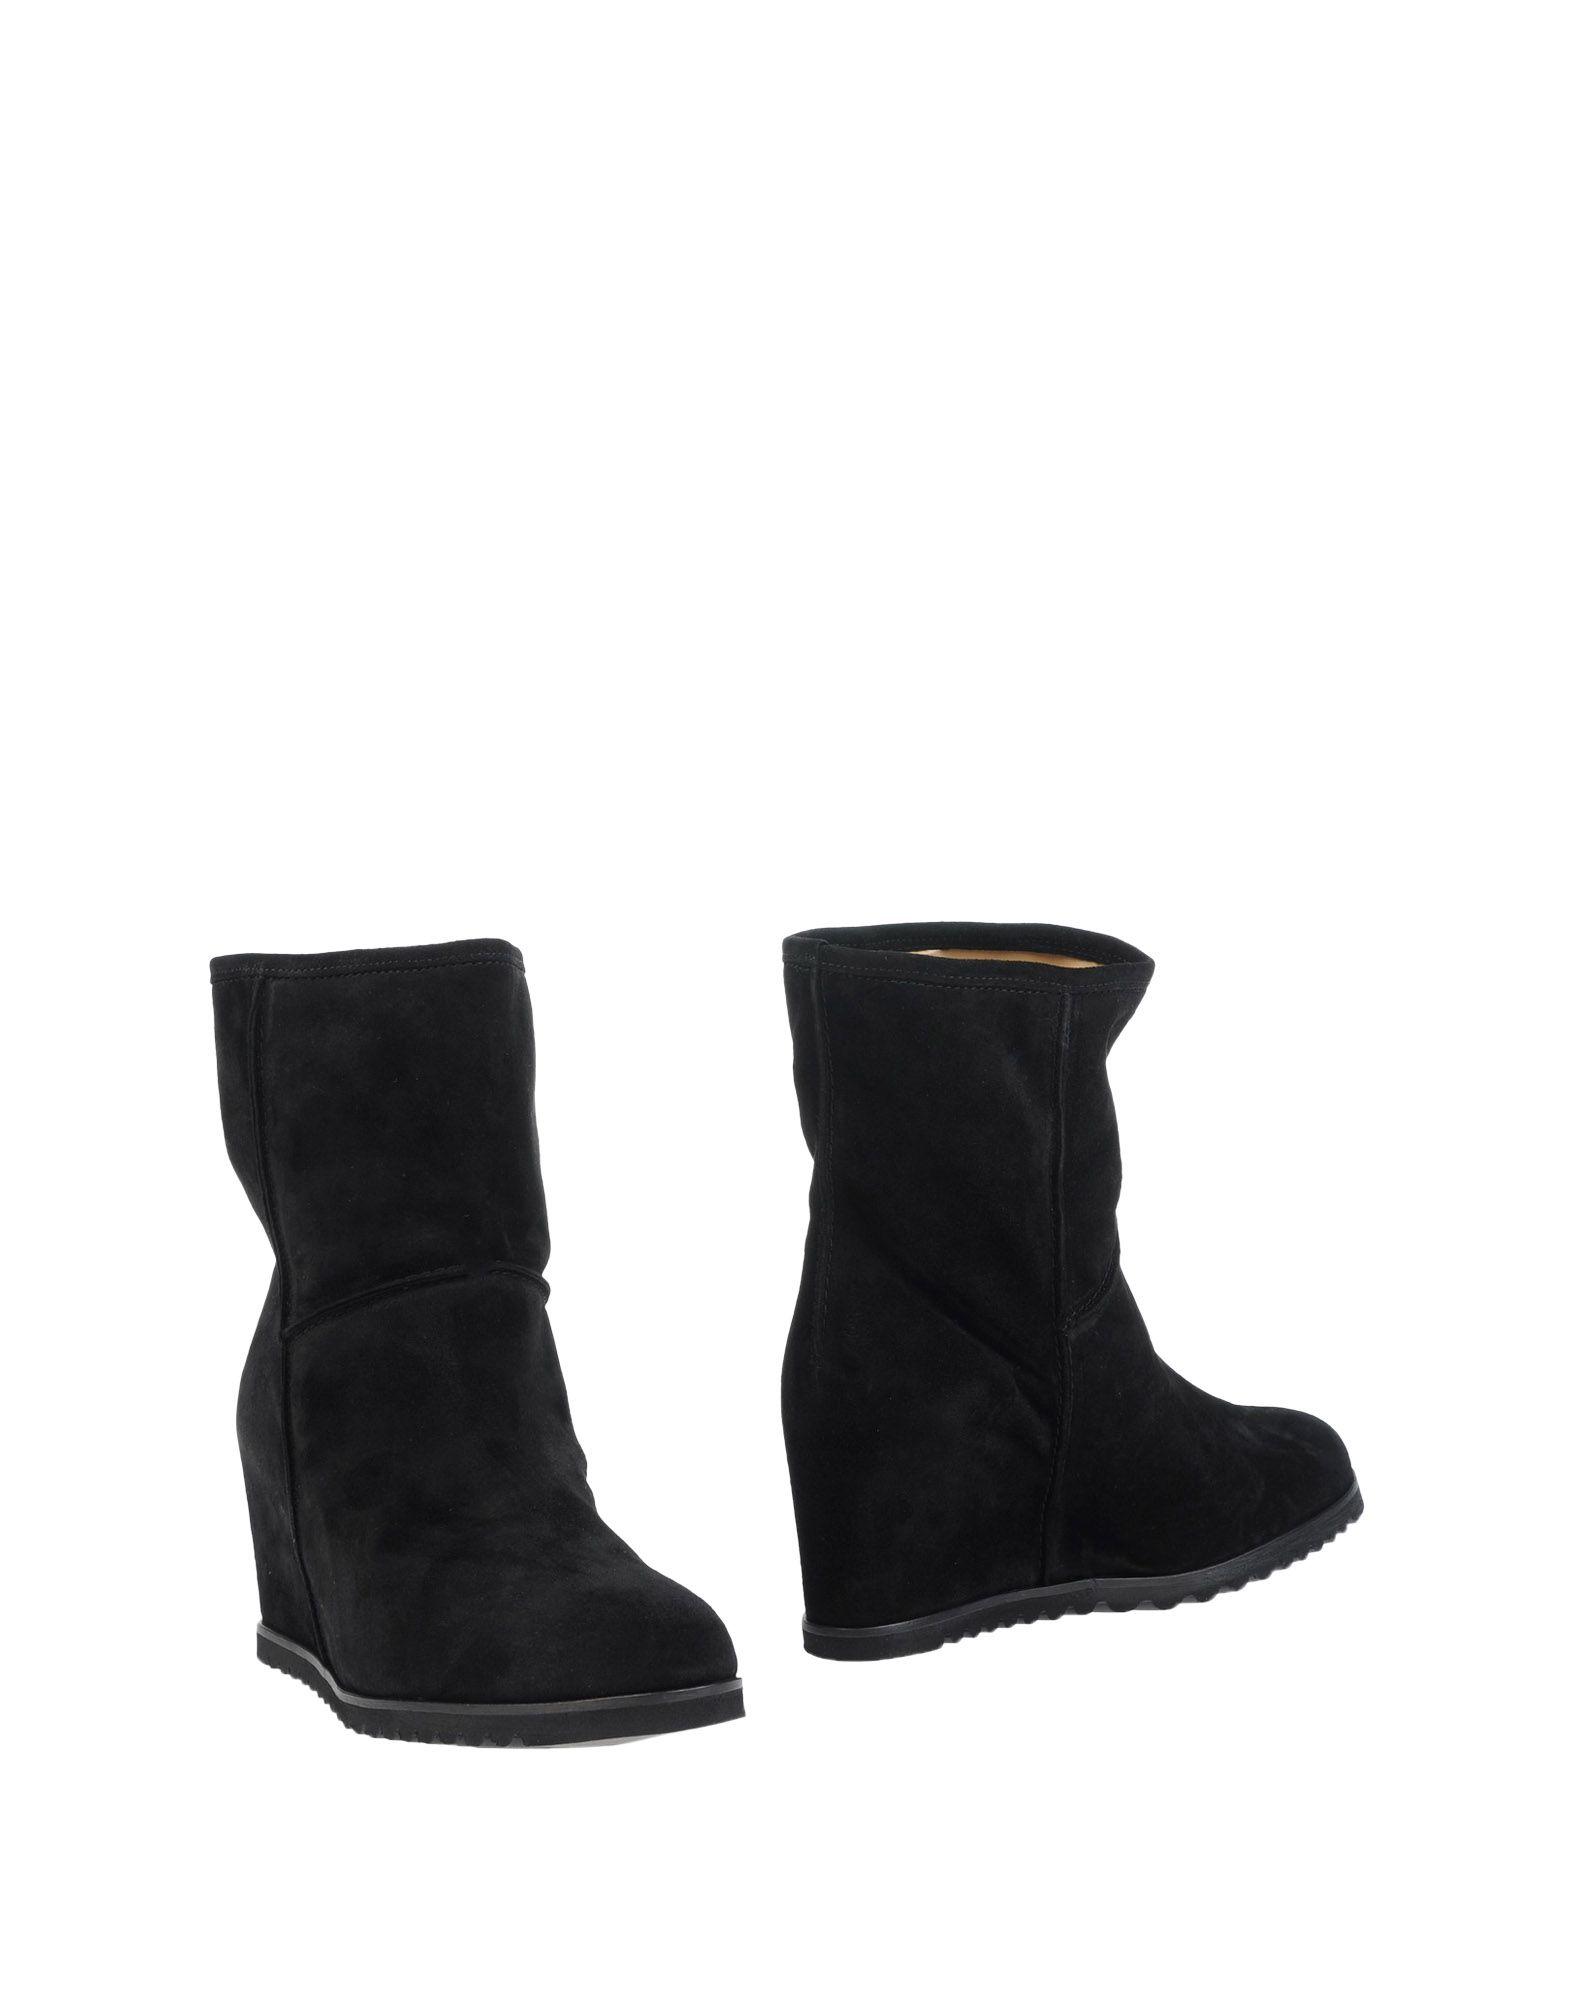 Gut um Rusconi billige Schuhe zu tragenFabio Rusconi um Stiefelette Damen  44866630SX ba2eab